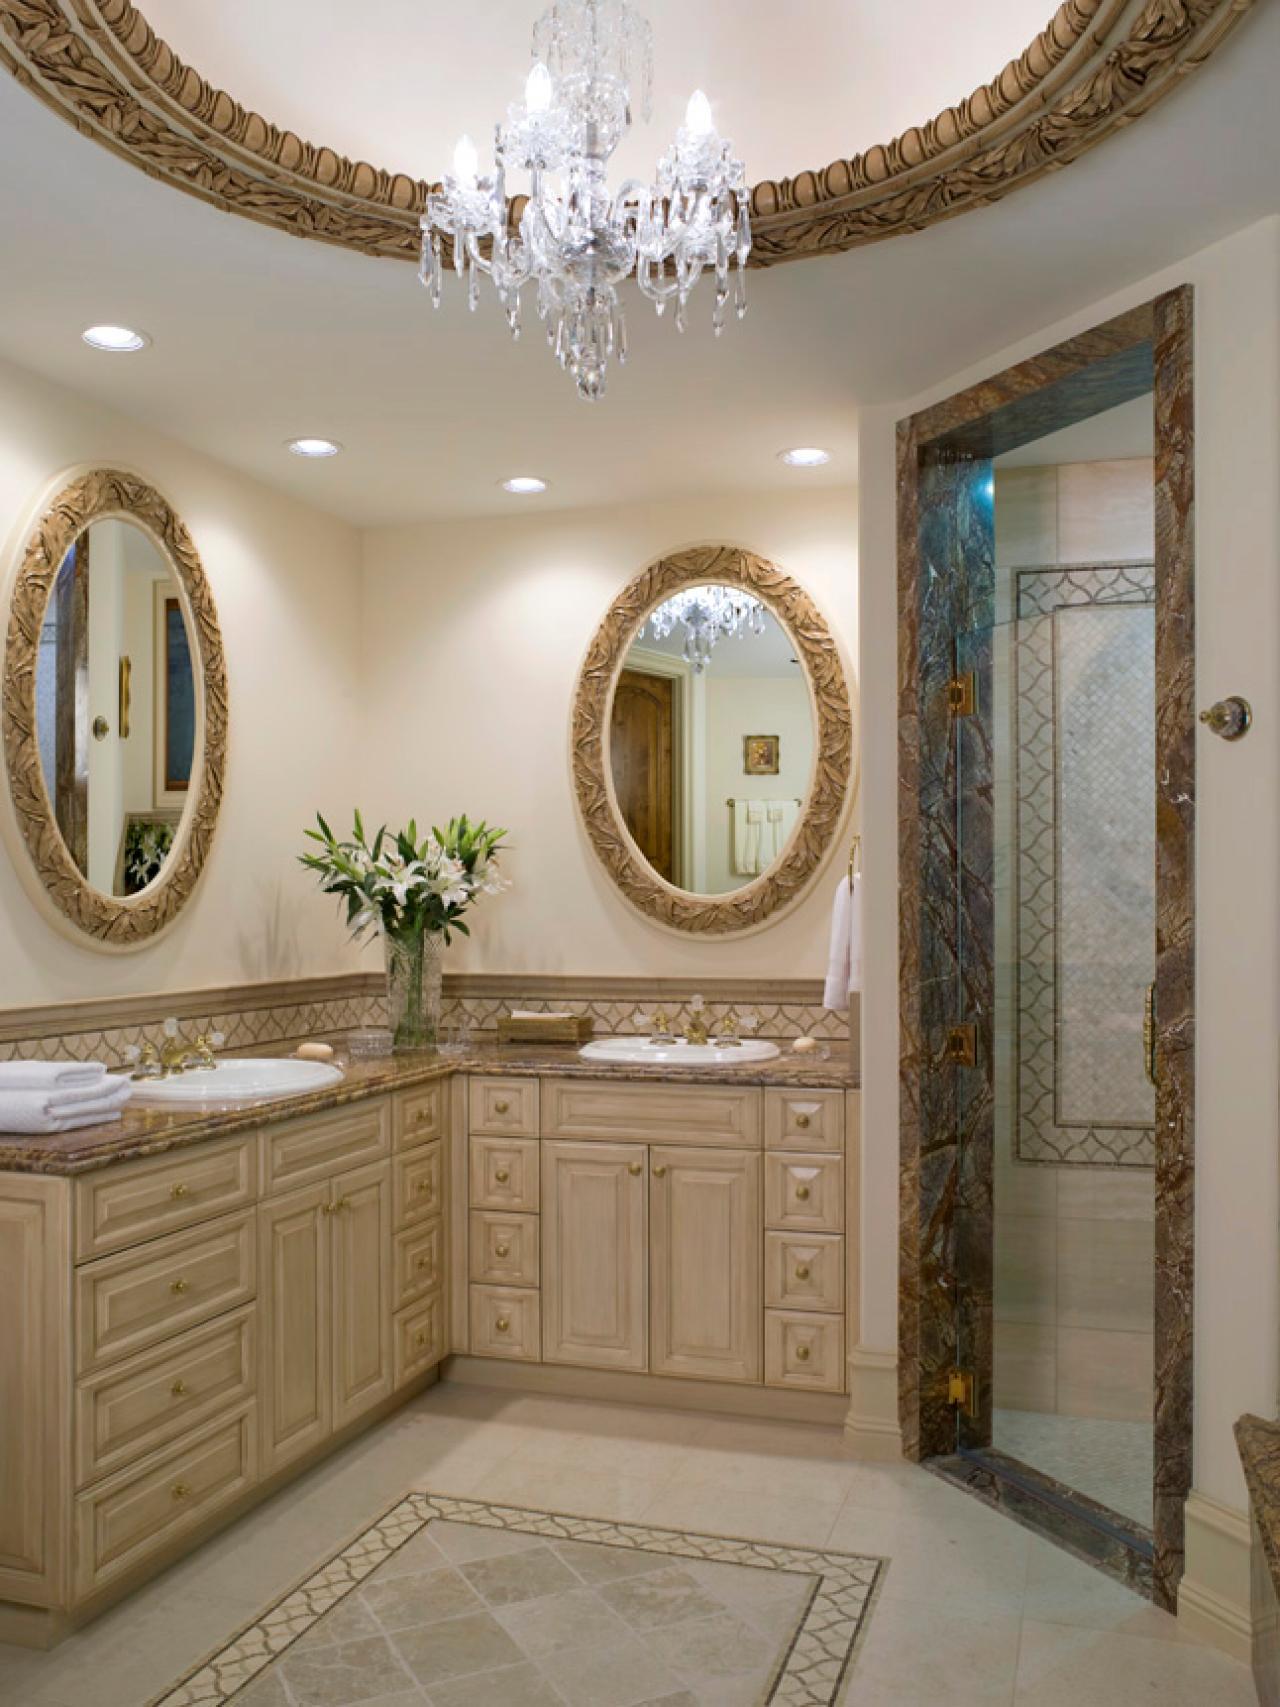 Mirrored bathroom vanity - Mirrored Bathroom Vanities